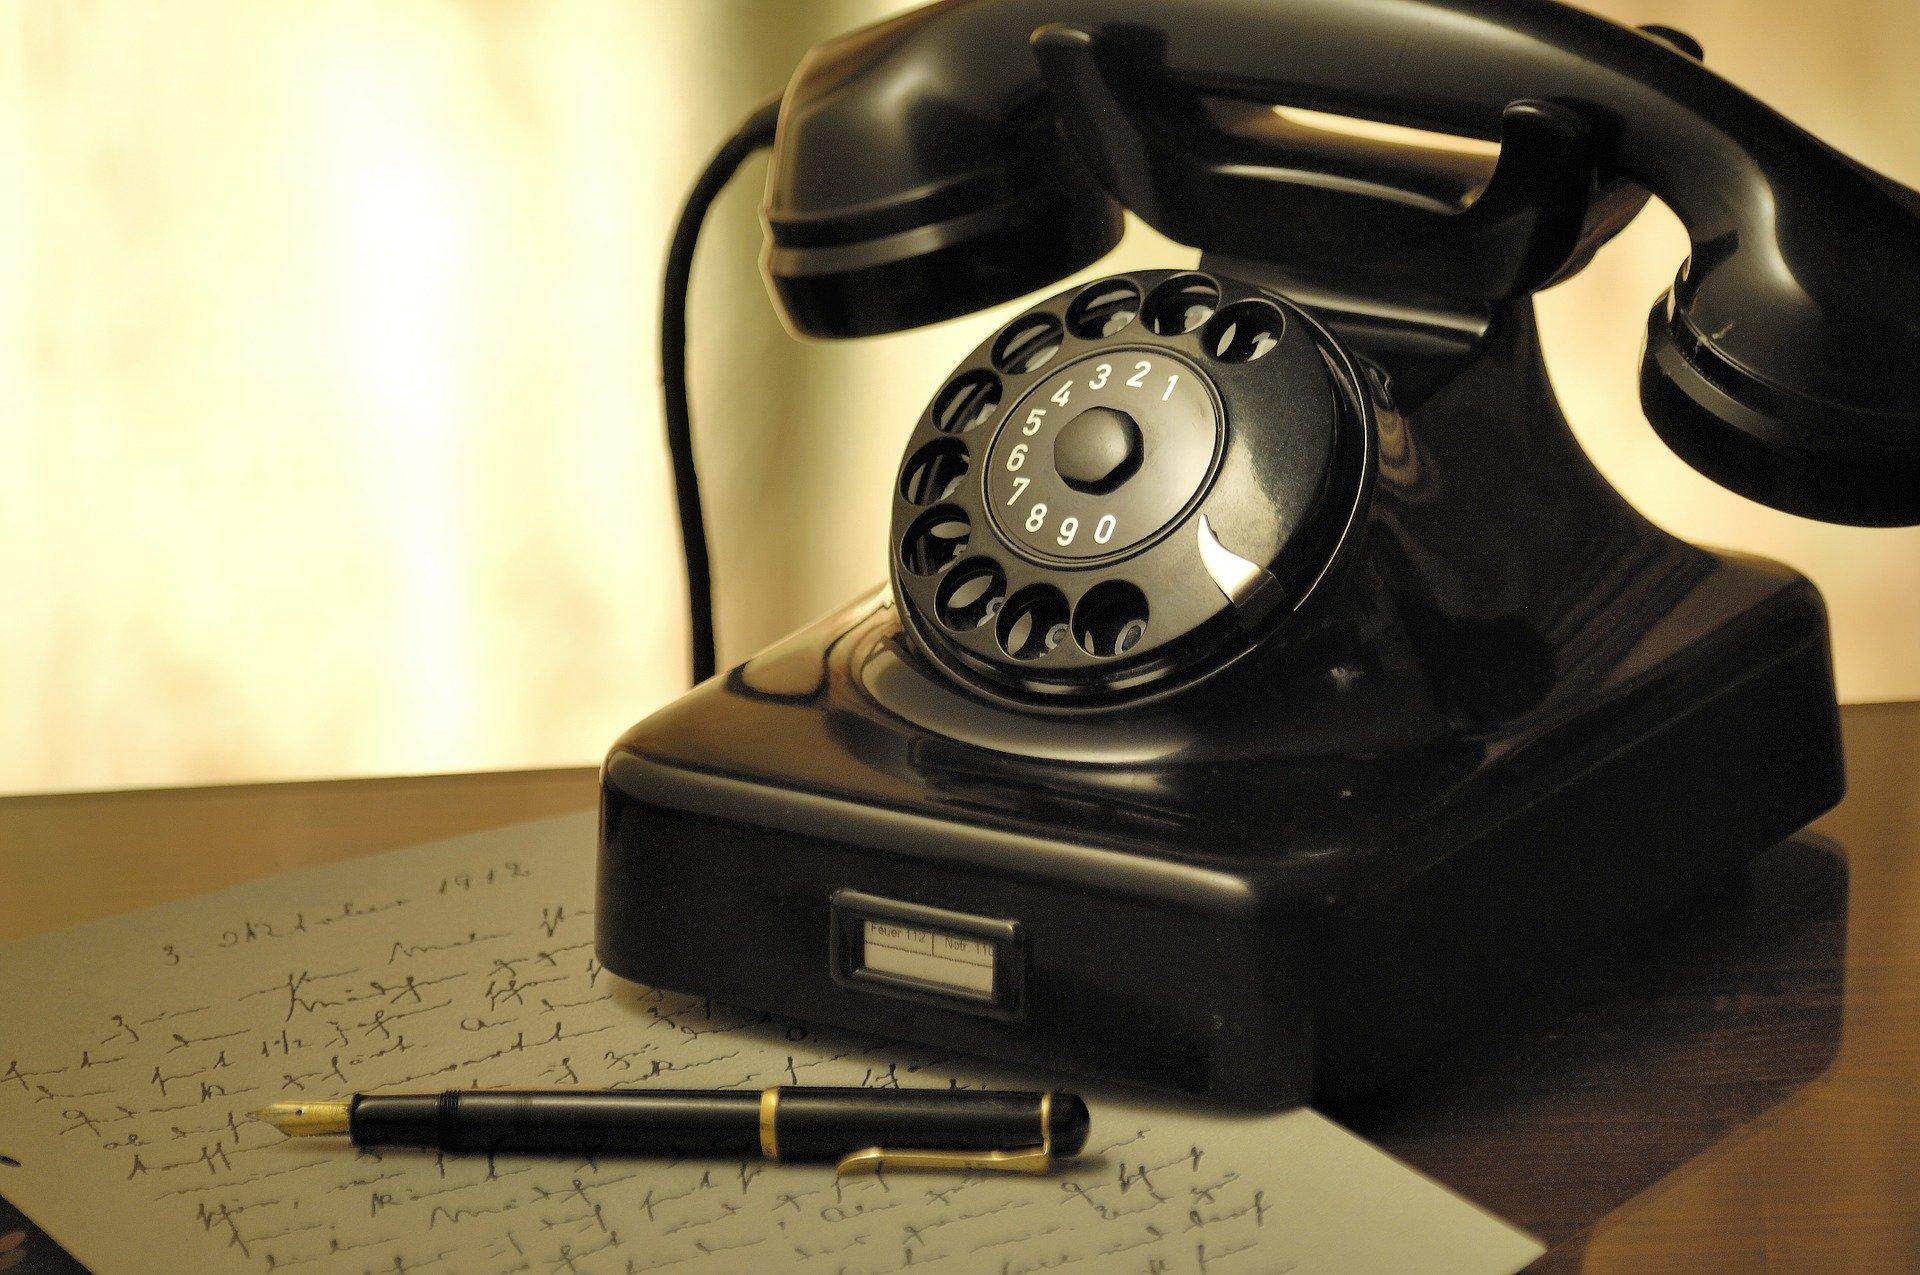 stary klasyczny telefon stacjonarny